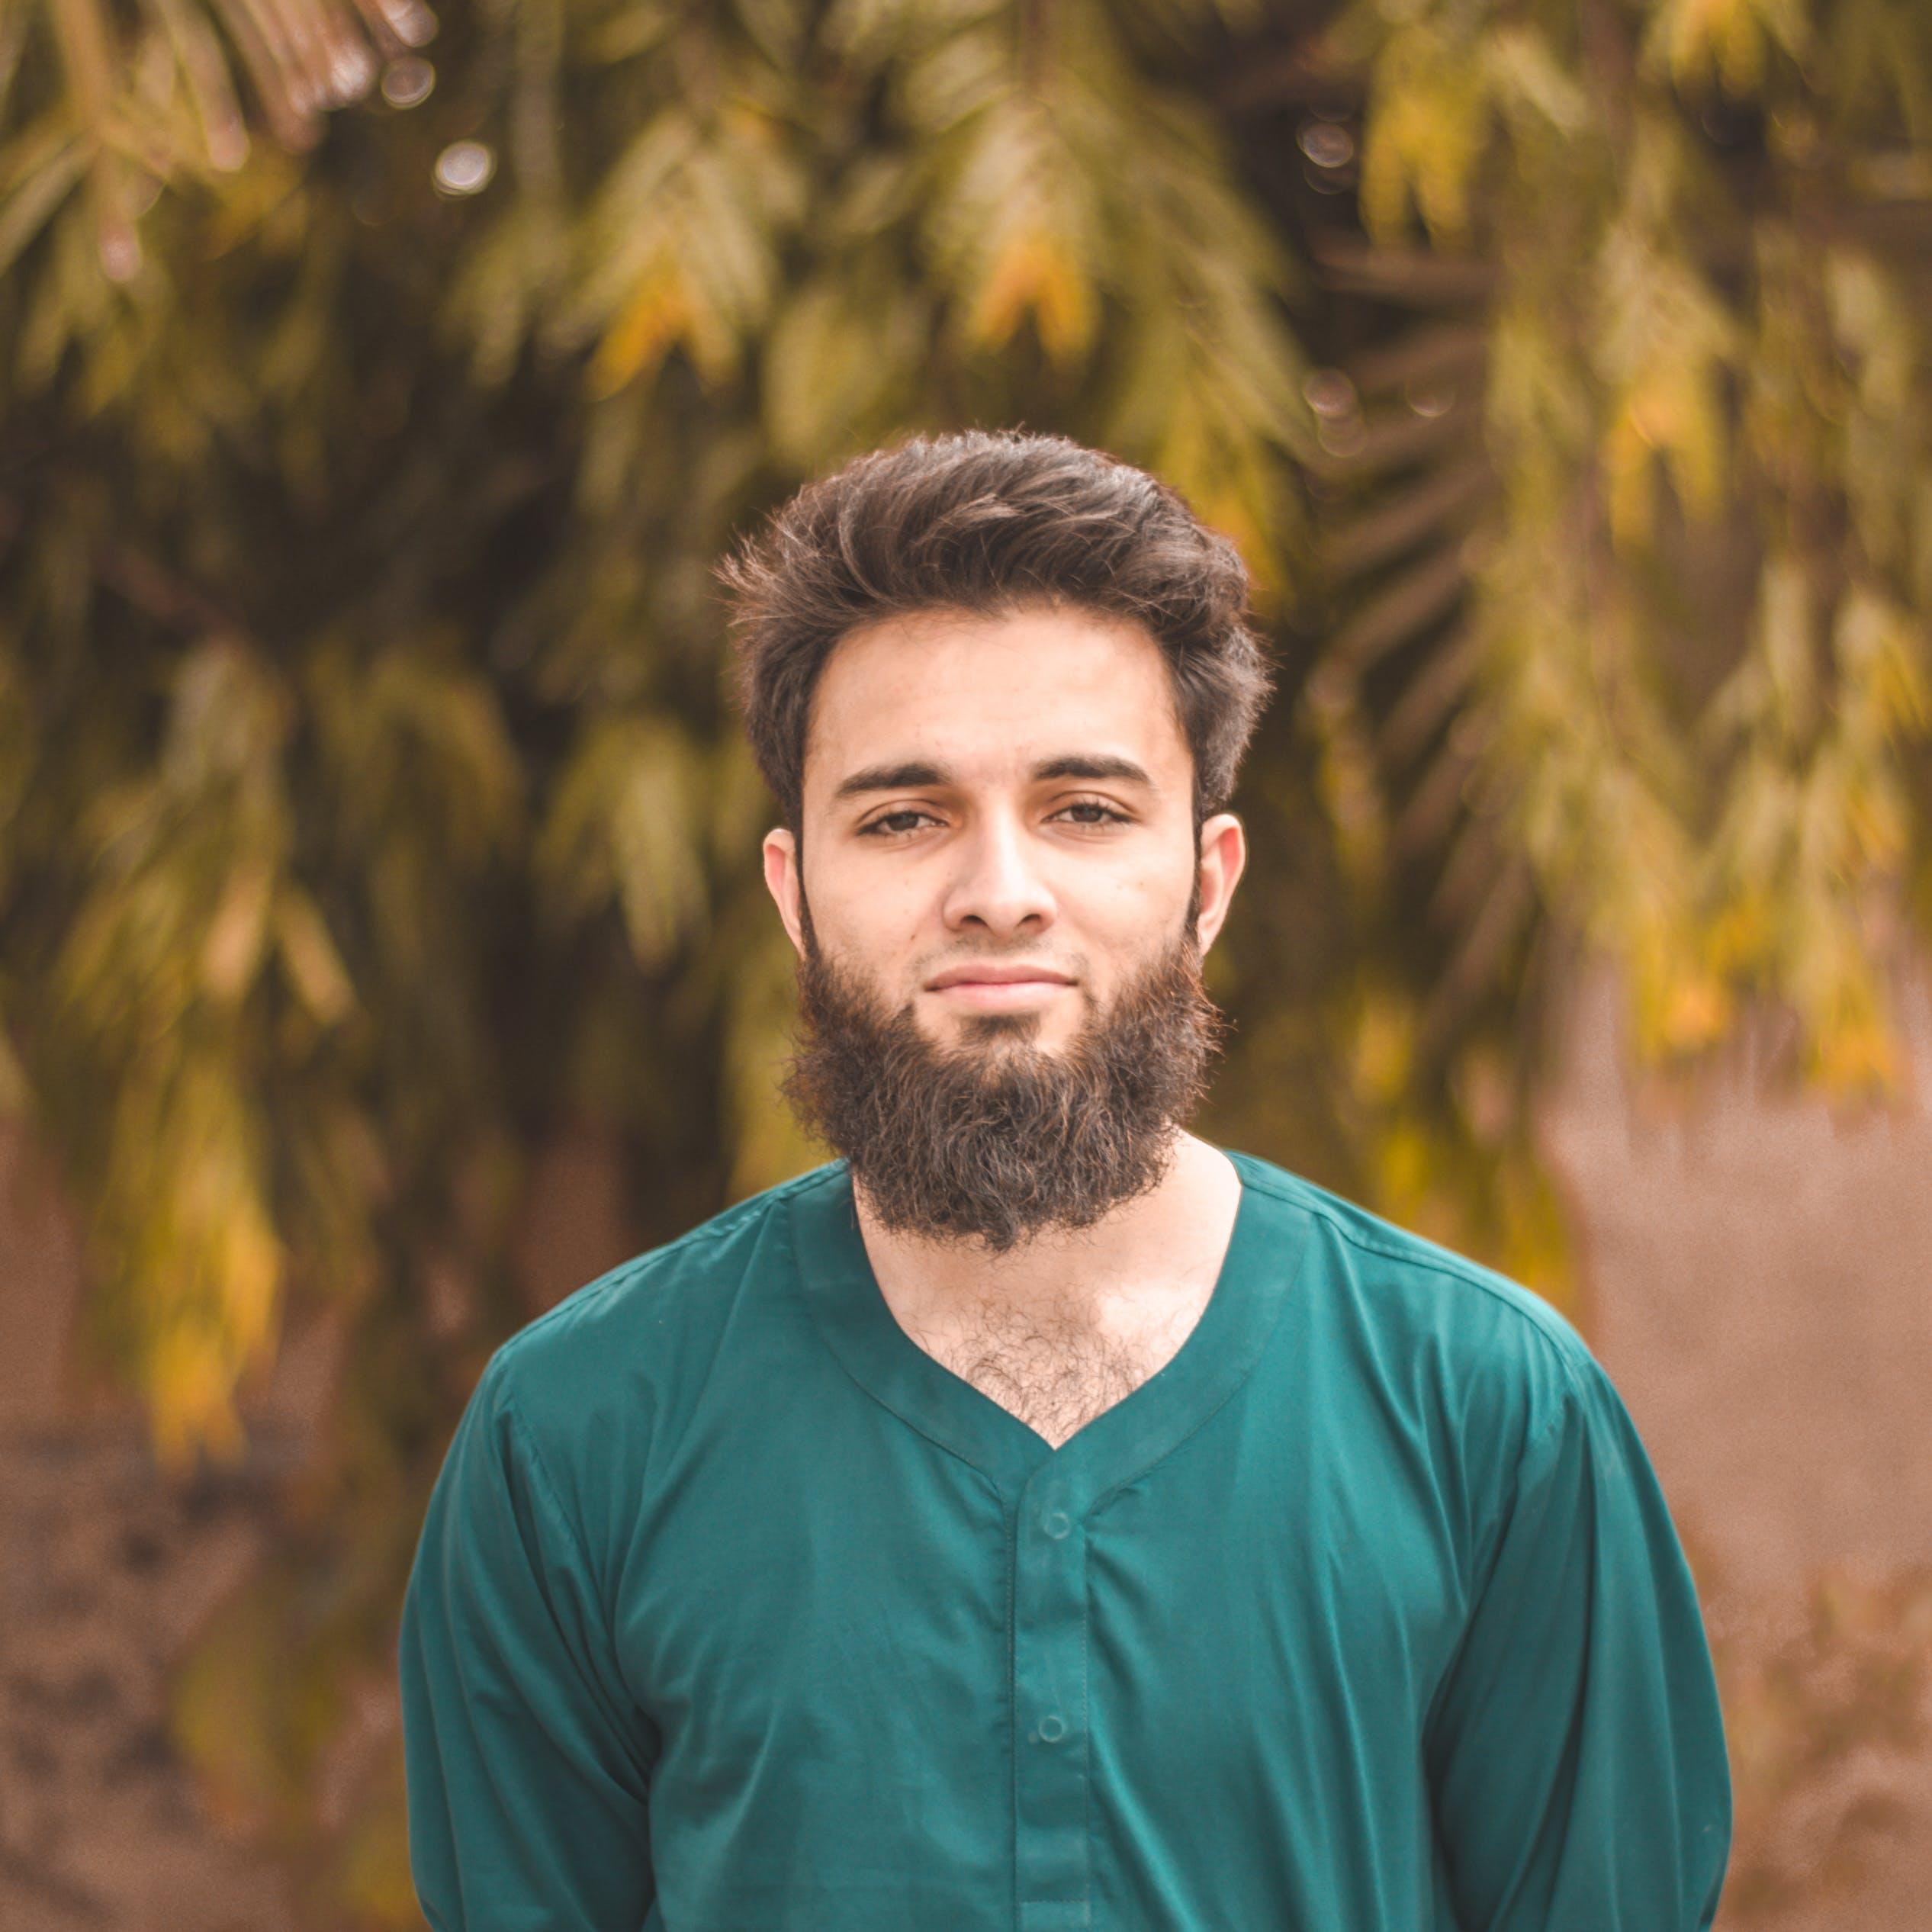 Free stock photo of 50mm, beard, bokeh, brown hair